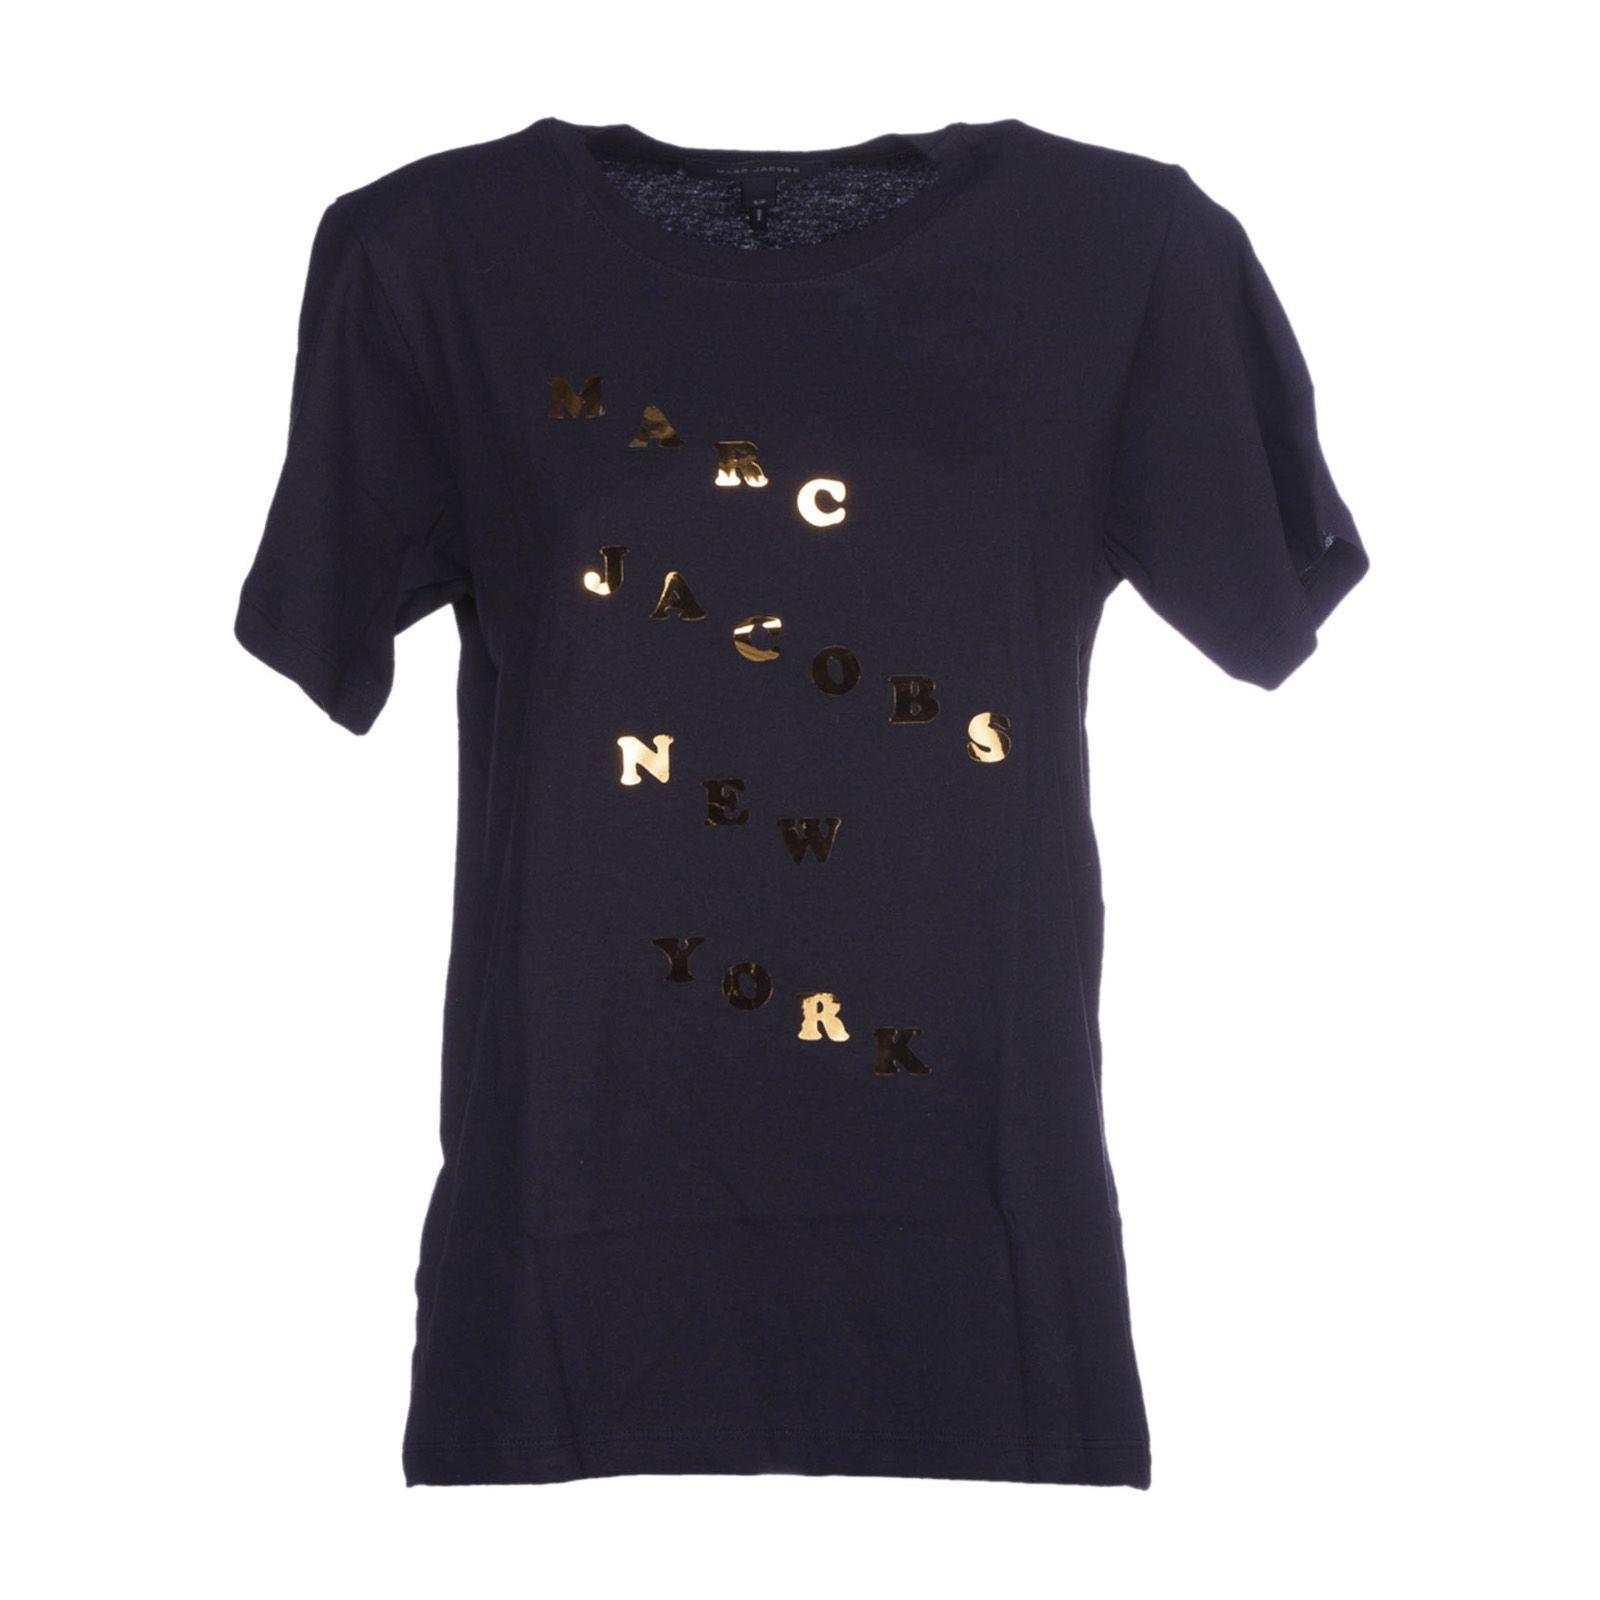 Marc Jacobs New York T-shirt